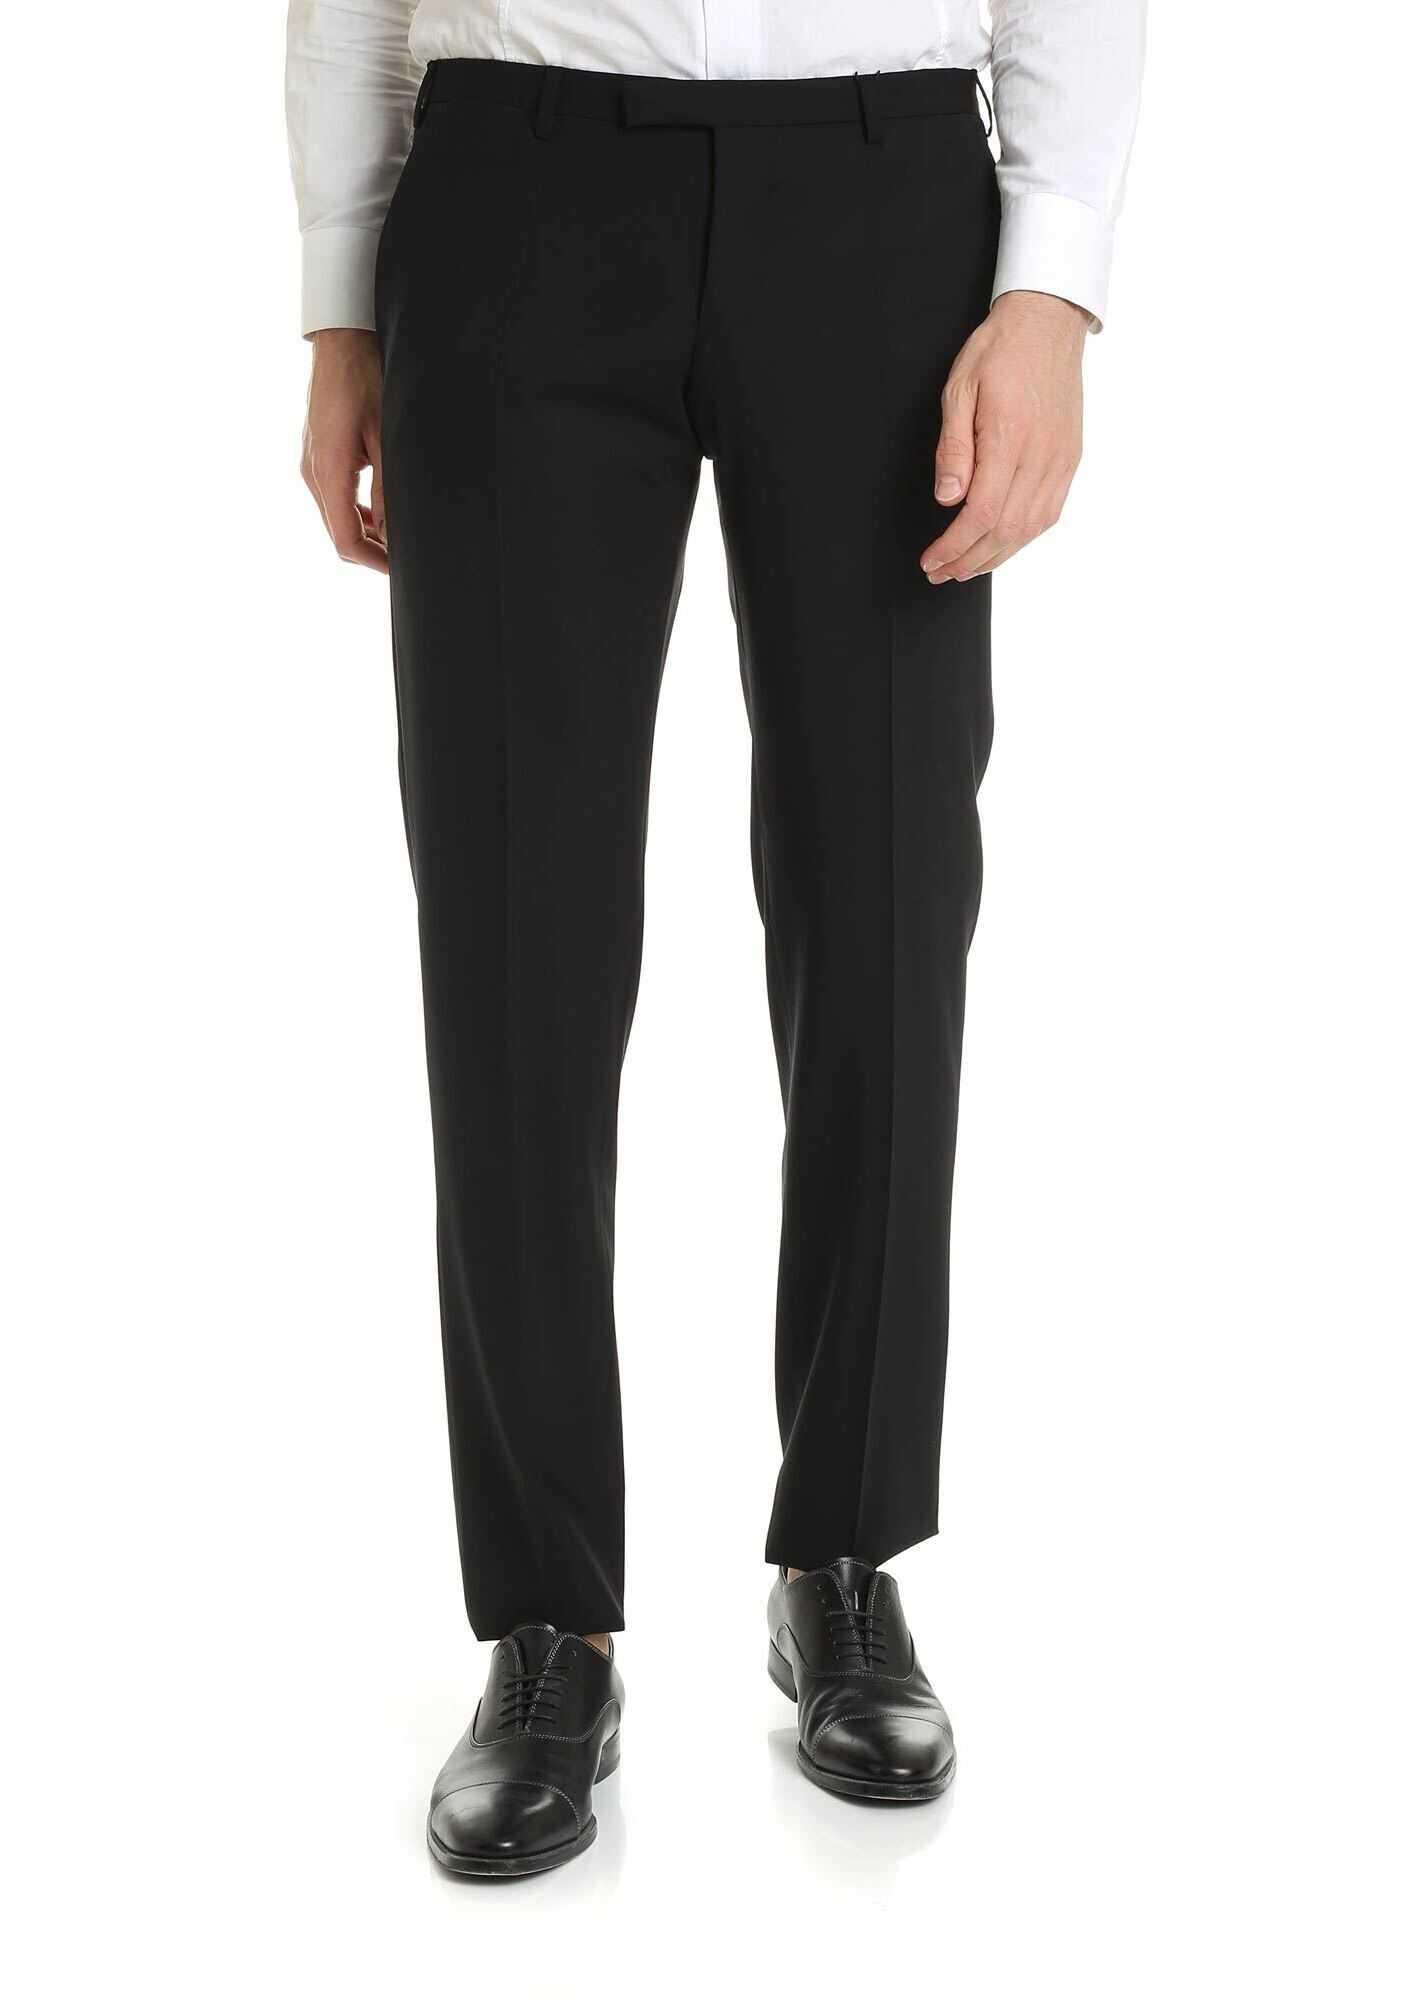 Emporio Armani Virgin Wool Trousers In Black Black imagine